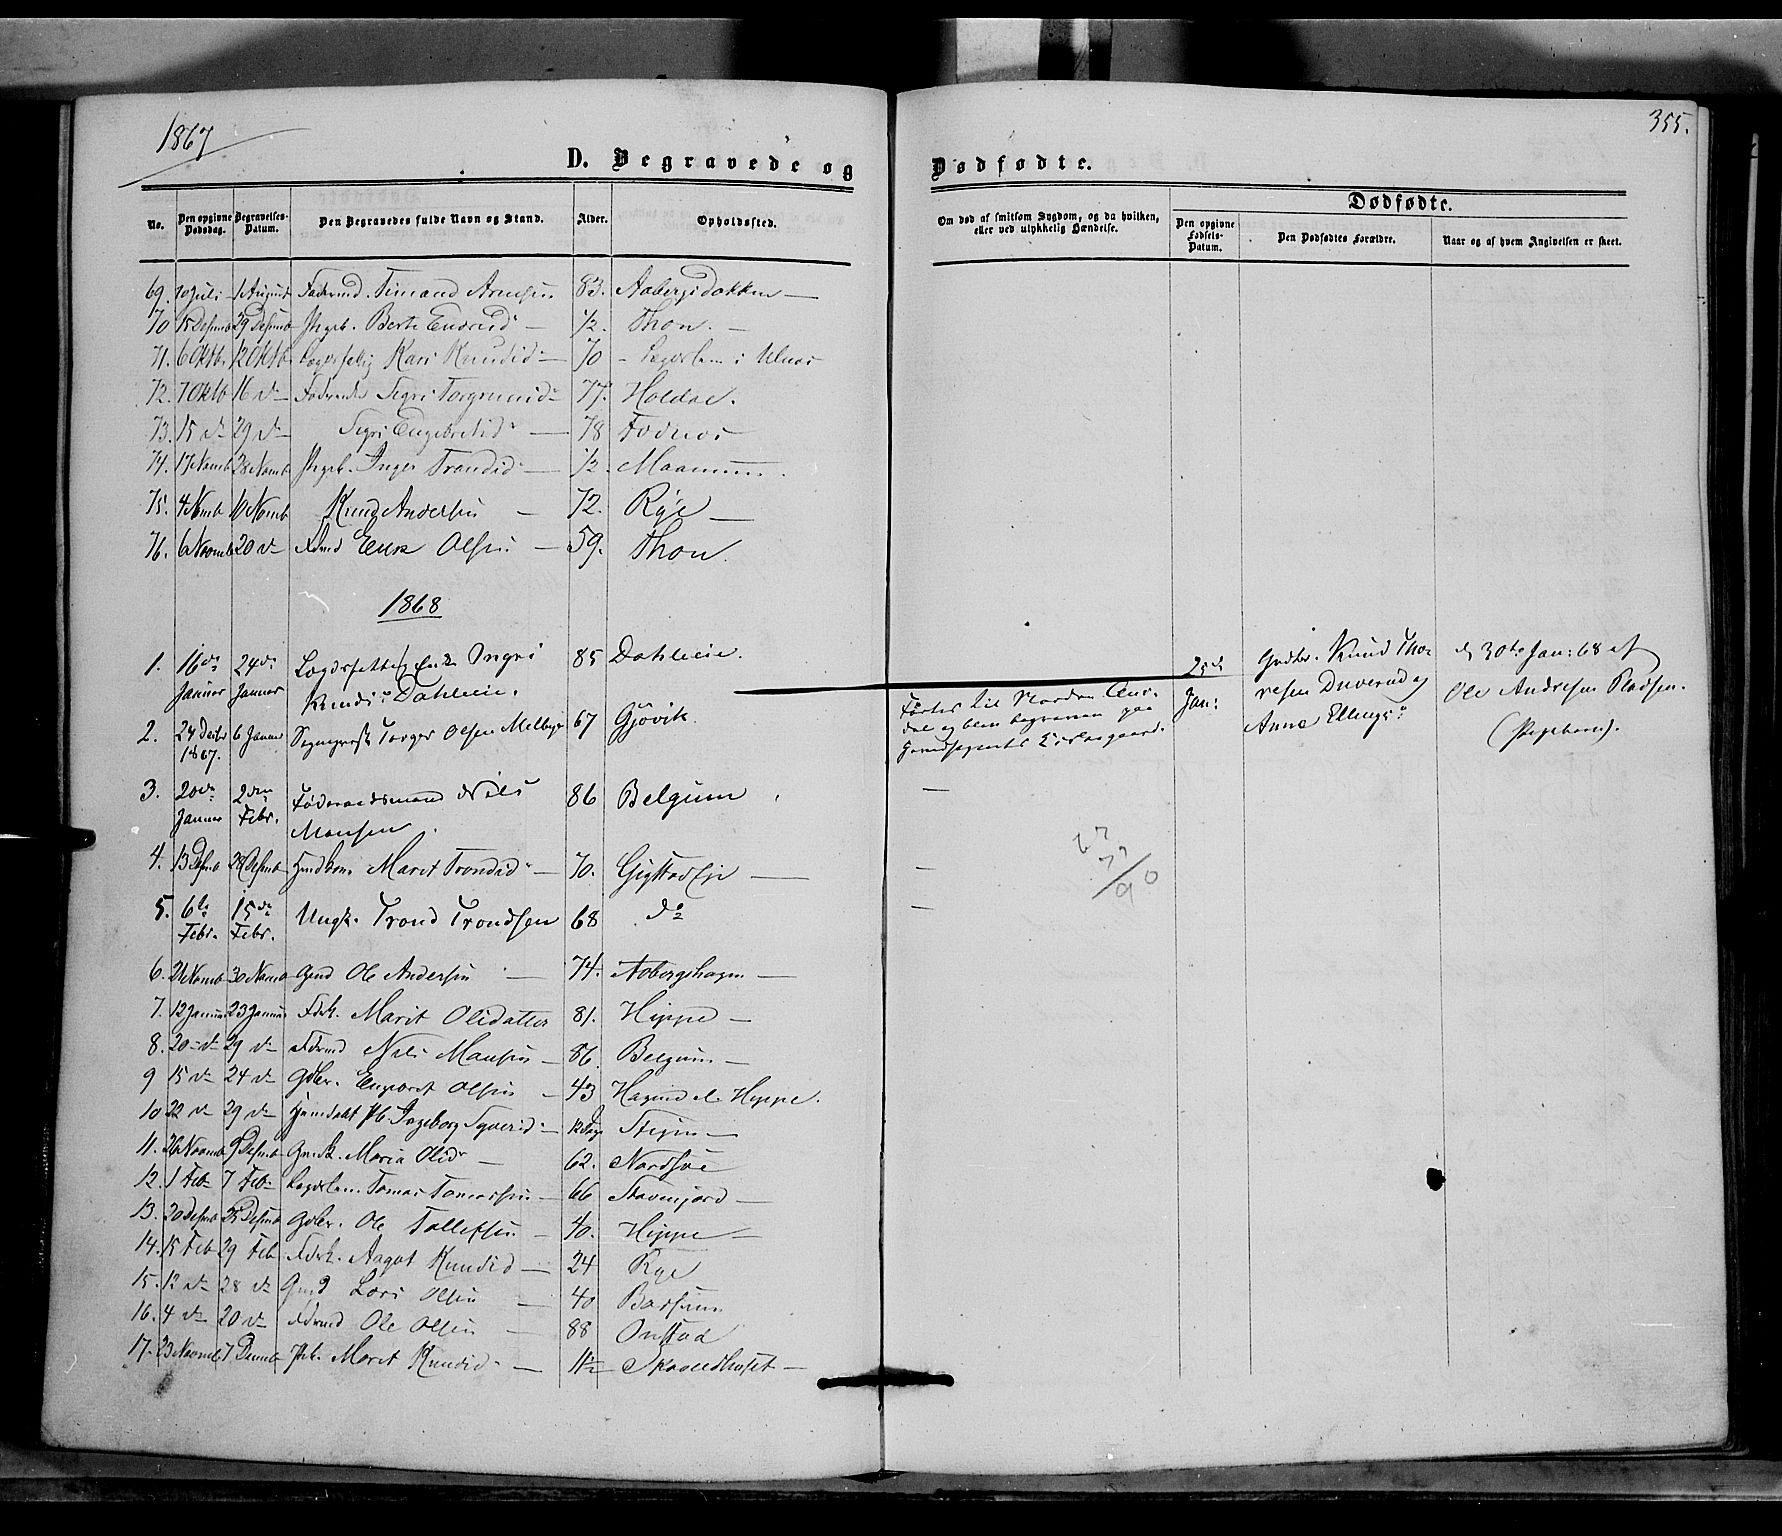 SAH, Nord-Aurdal prestekontor, Ministerialbok nr. 8, 1863-1875, s. 355